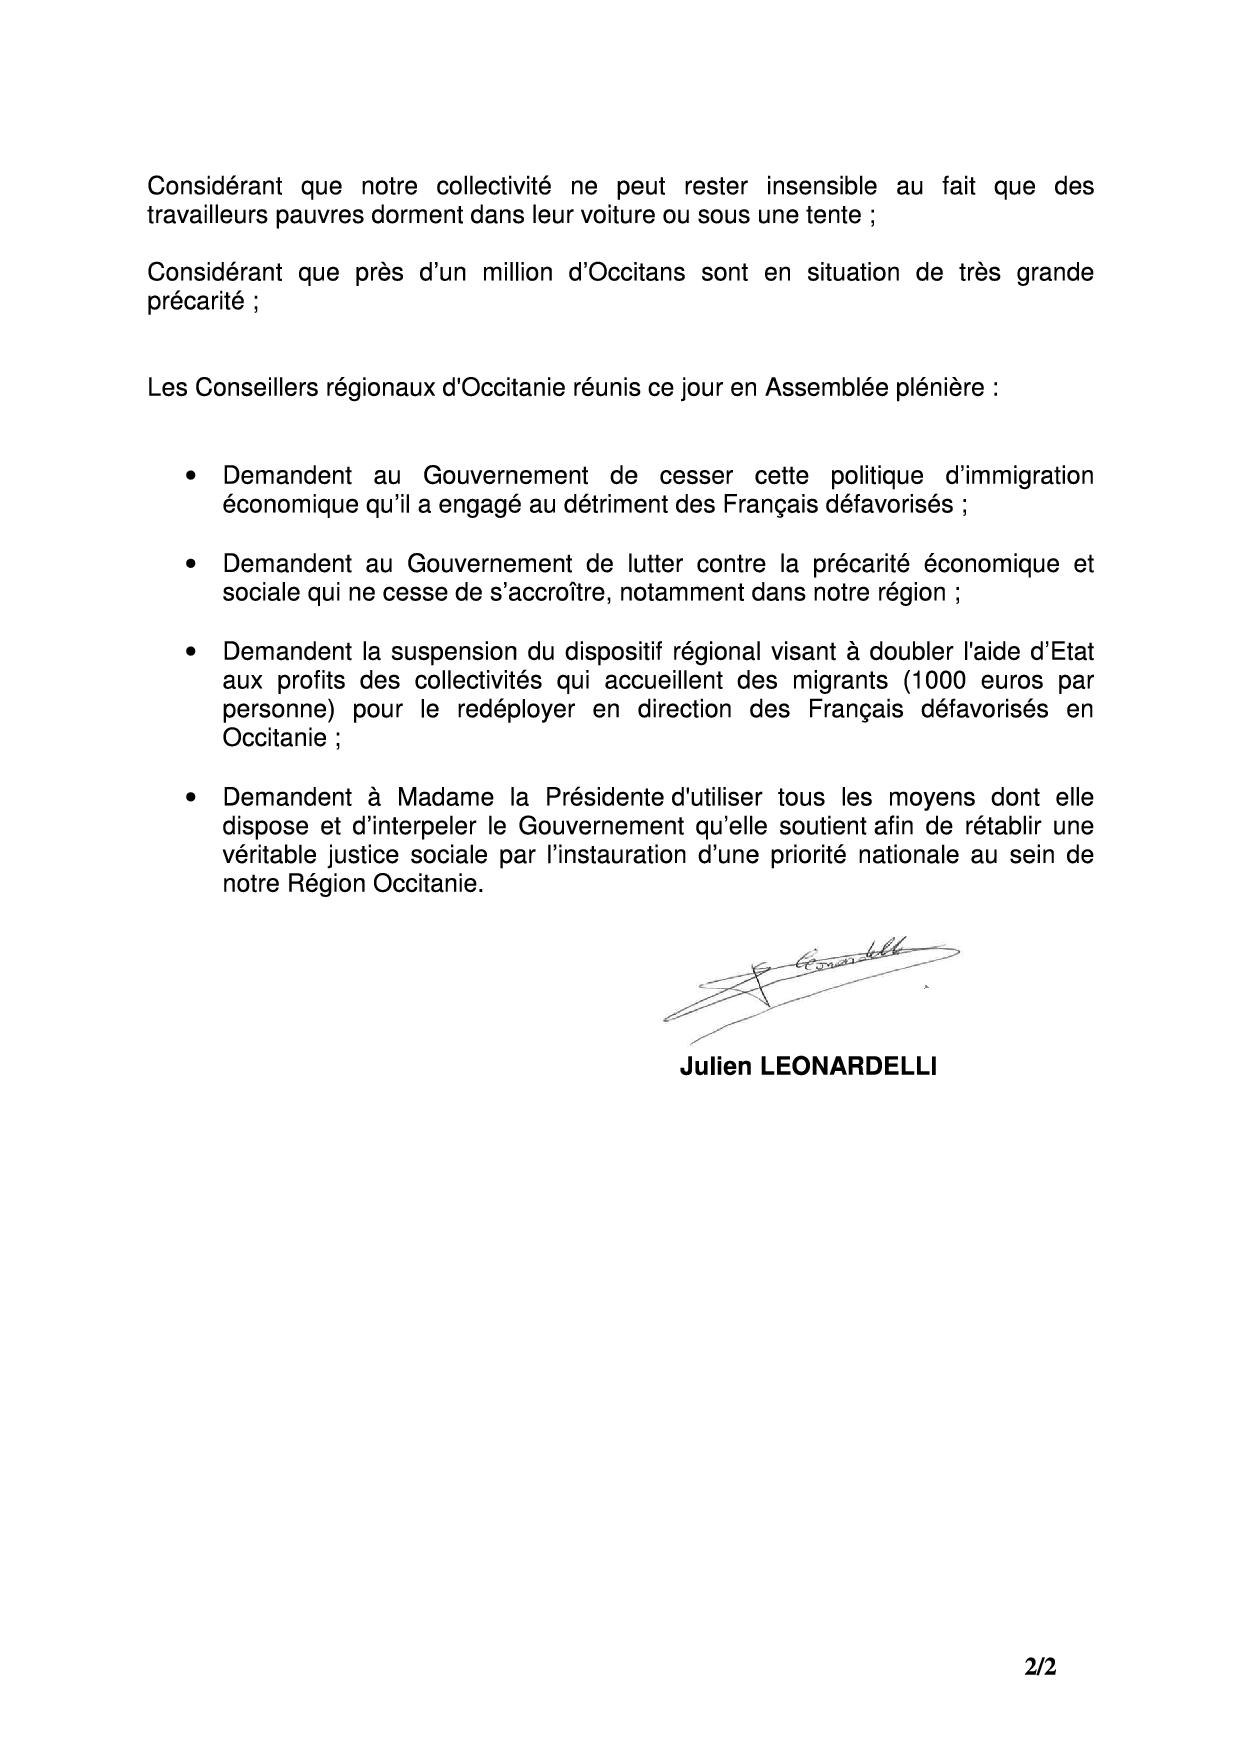 occitanie_voeu_leonardelli_priorite_nationale_fn_p2